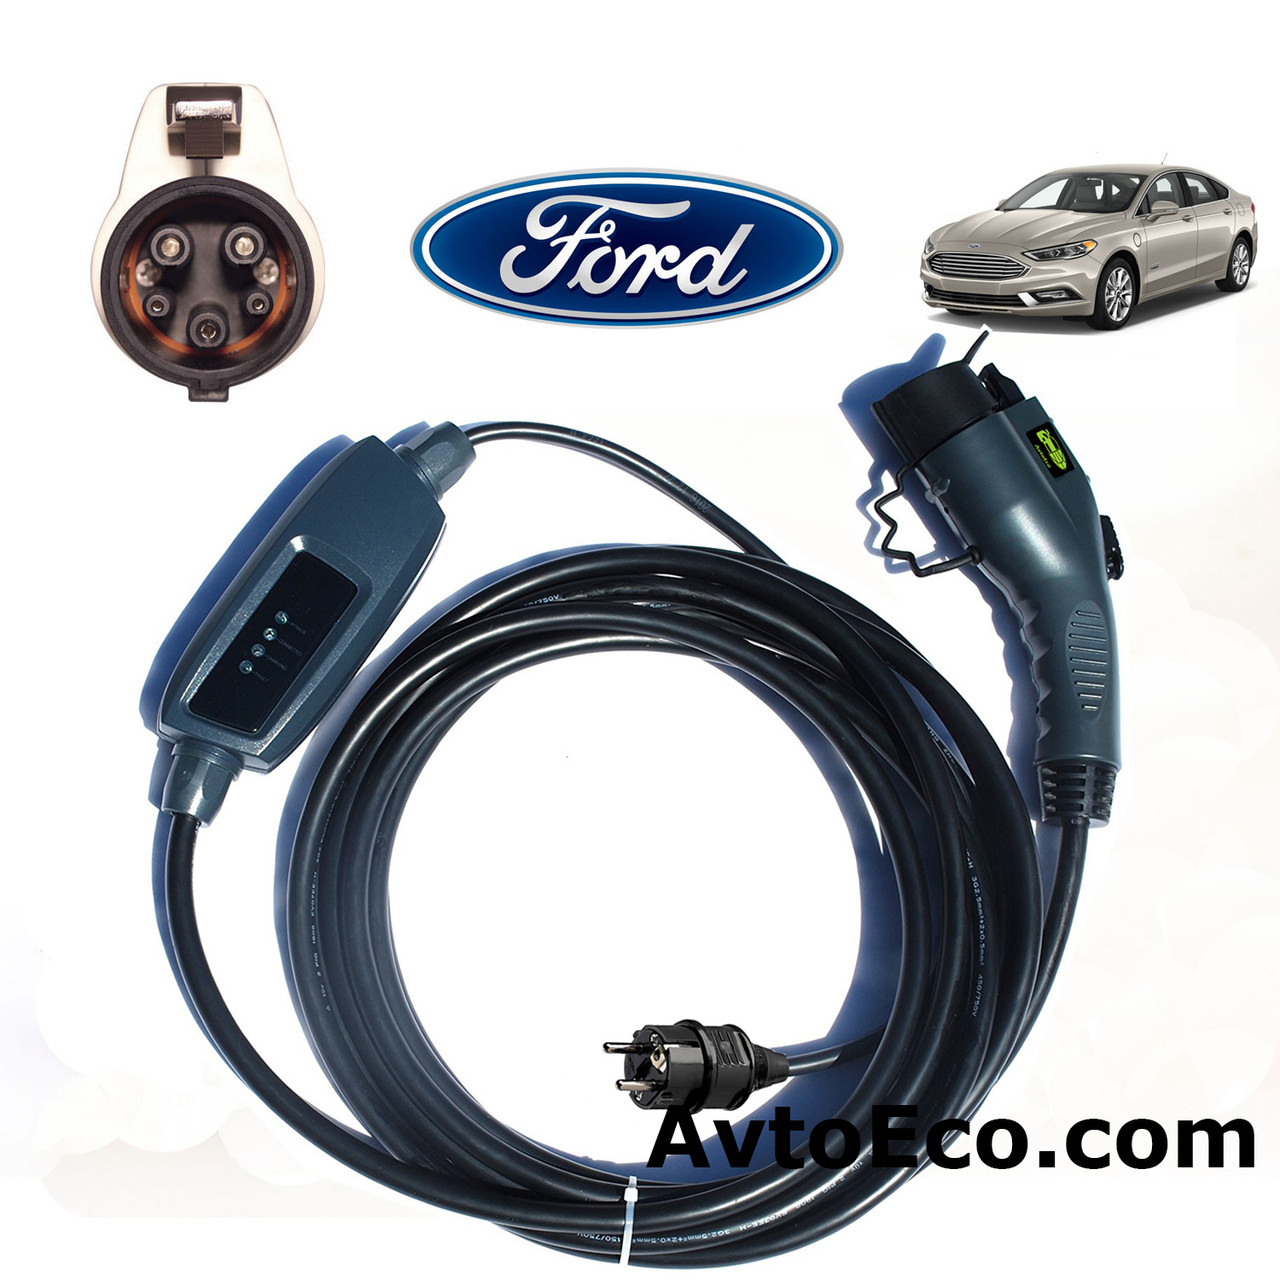 Зарядное устройство для электромобиля Ford Fusion Energi Duosida J1772-16A, фото 1